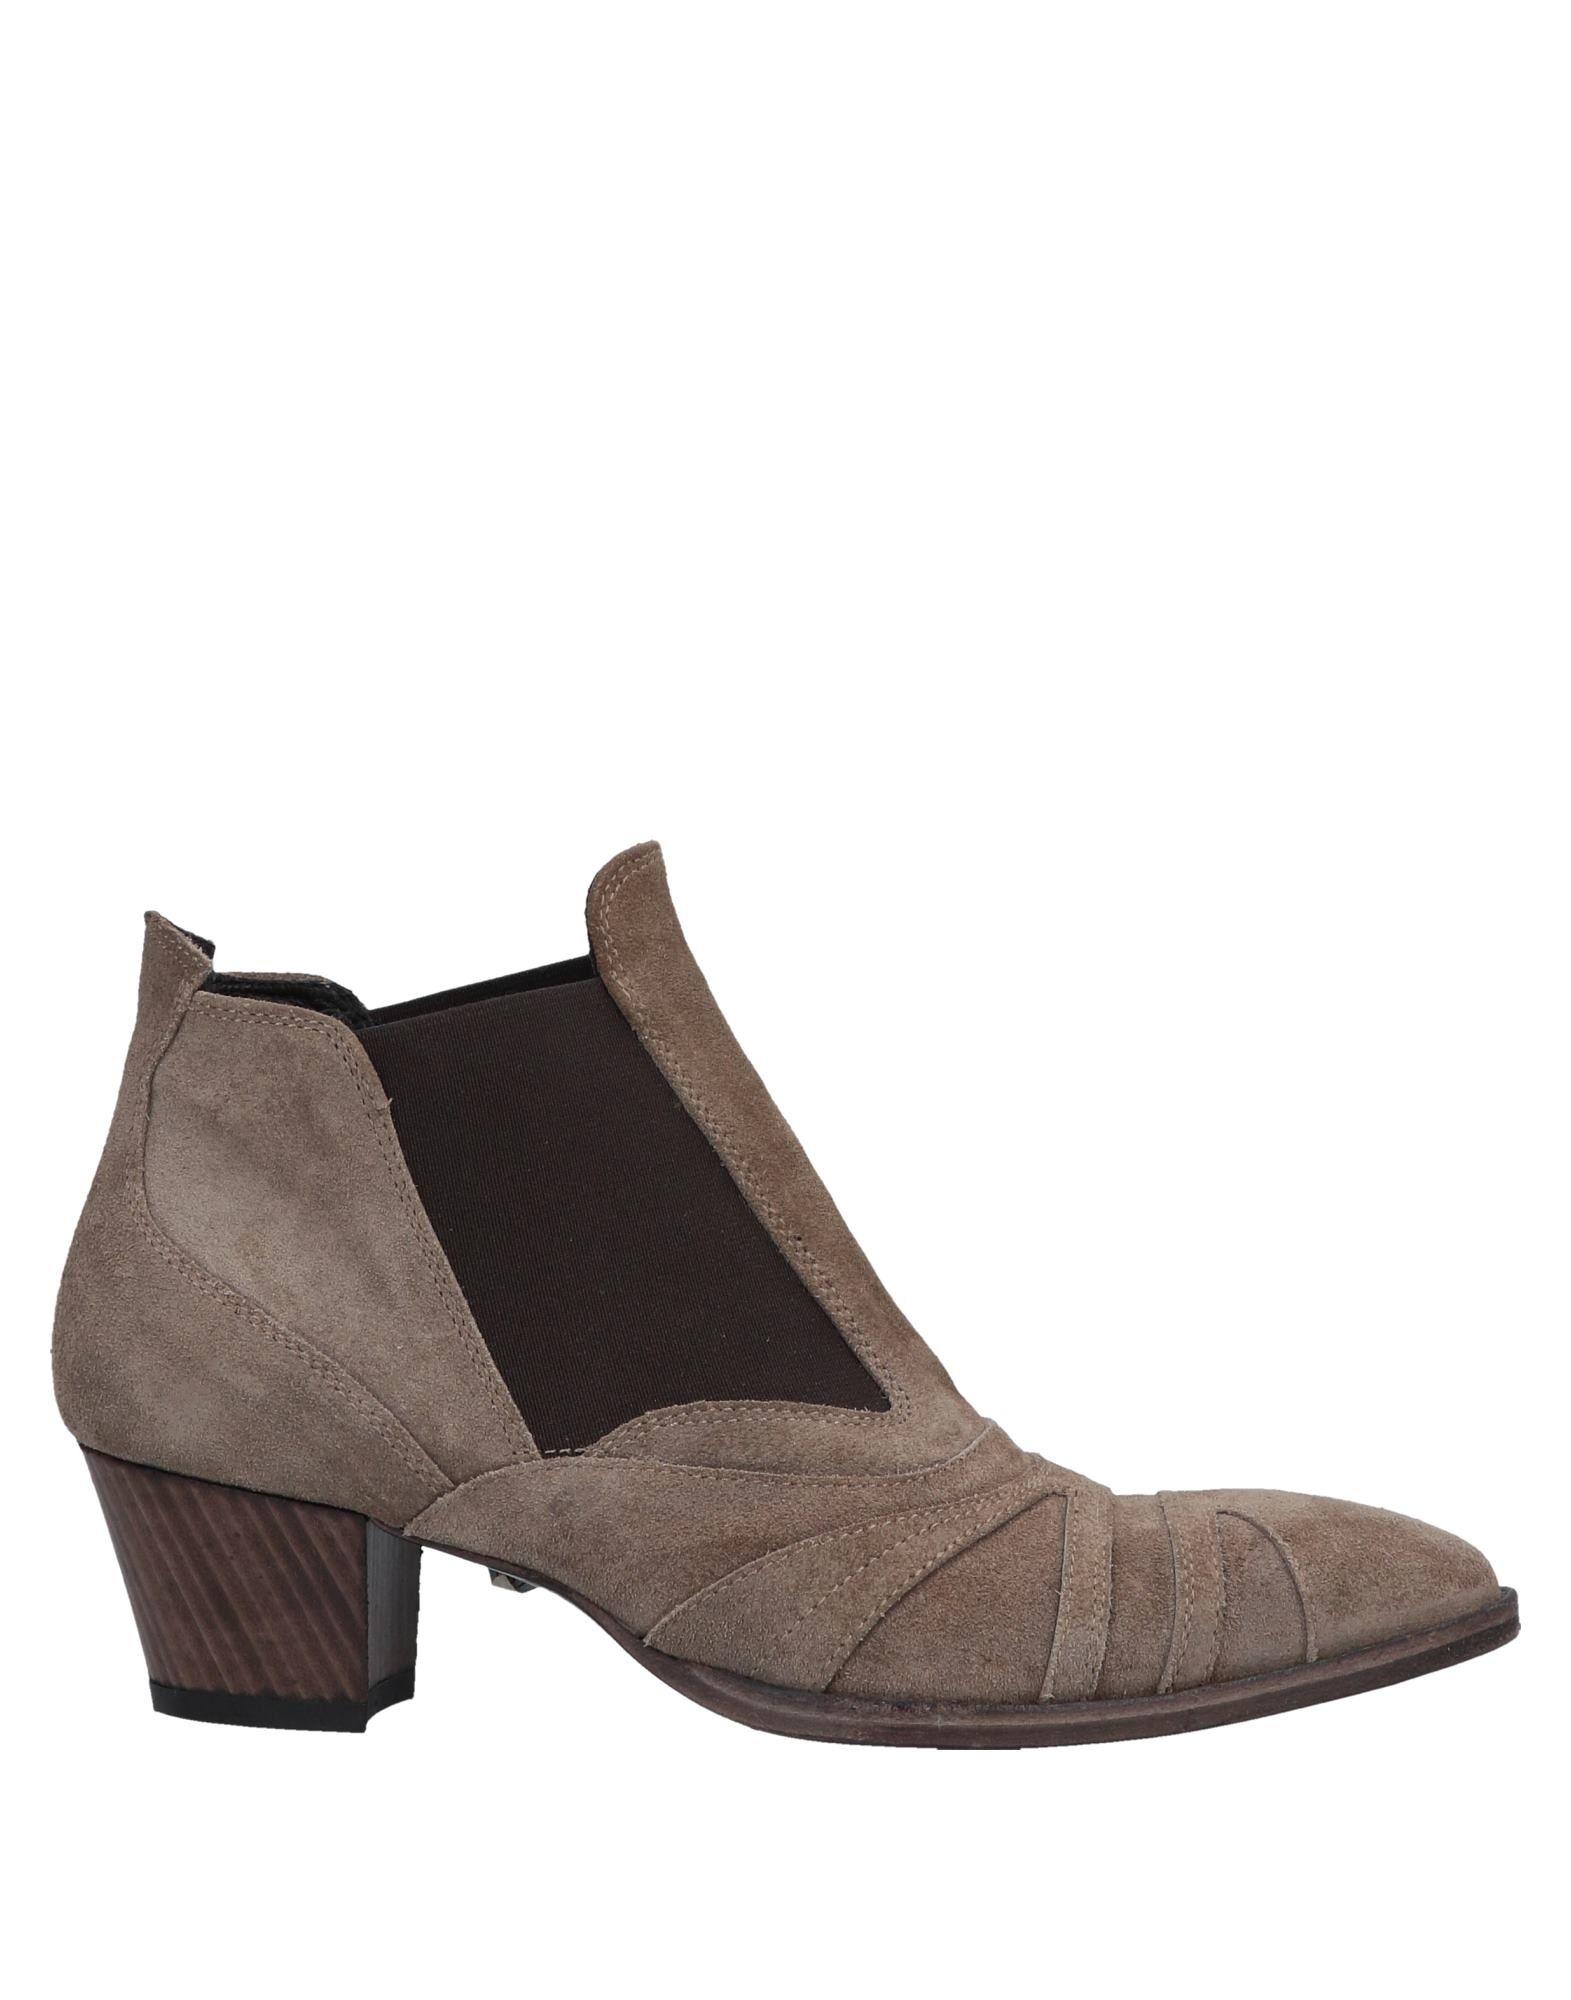 Фото - QSP+ QUELQUES SHOES DE PLUS Полусапоги и высокие ботинки women high heel shoes platform pumps woman thin high heels party wedding shoes ladies kitten heels plus size 34 40 41 42 43